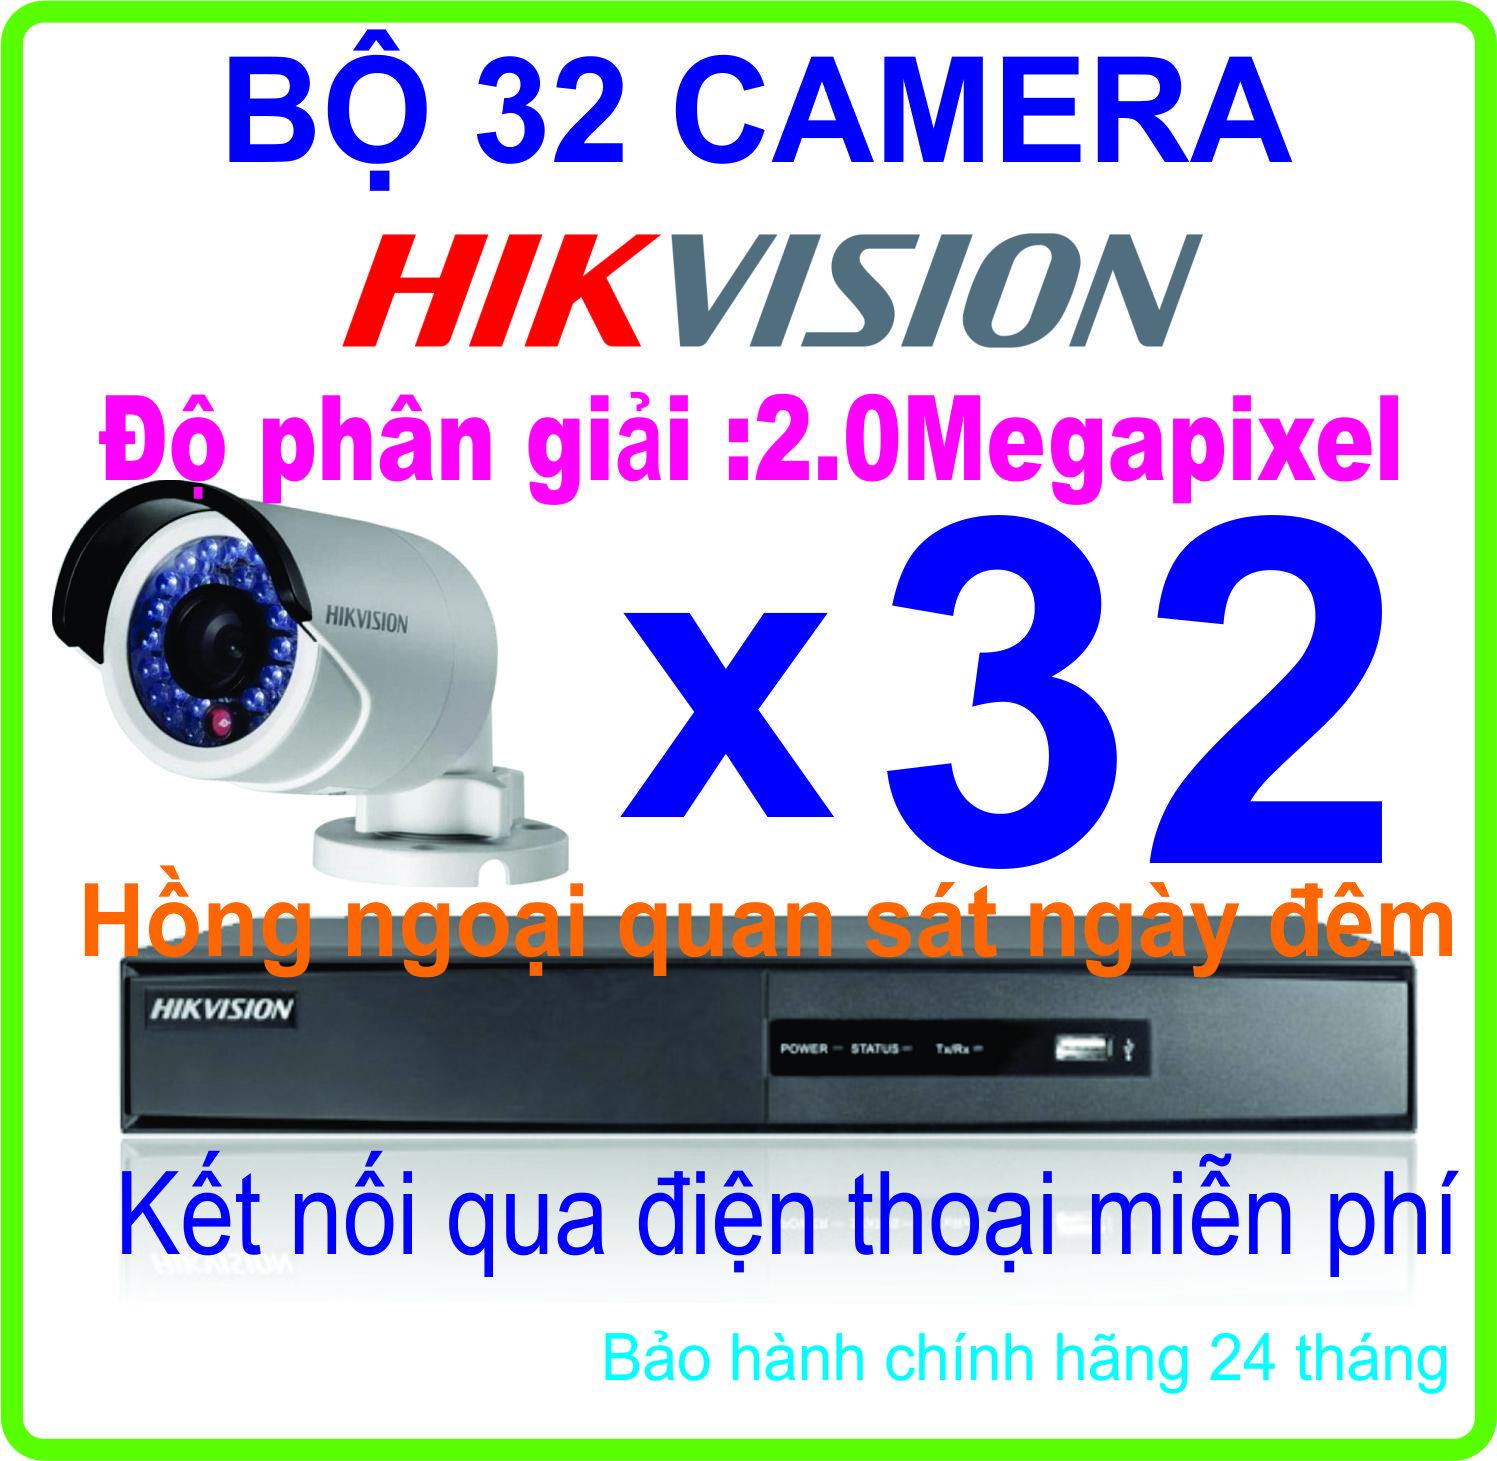 HỆ THỐNG 32 CAMERA HIKVISION 2.0Megapixel